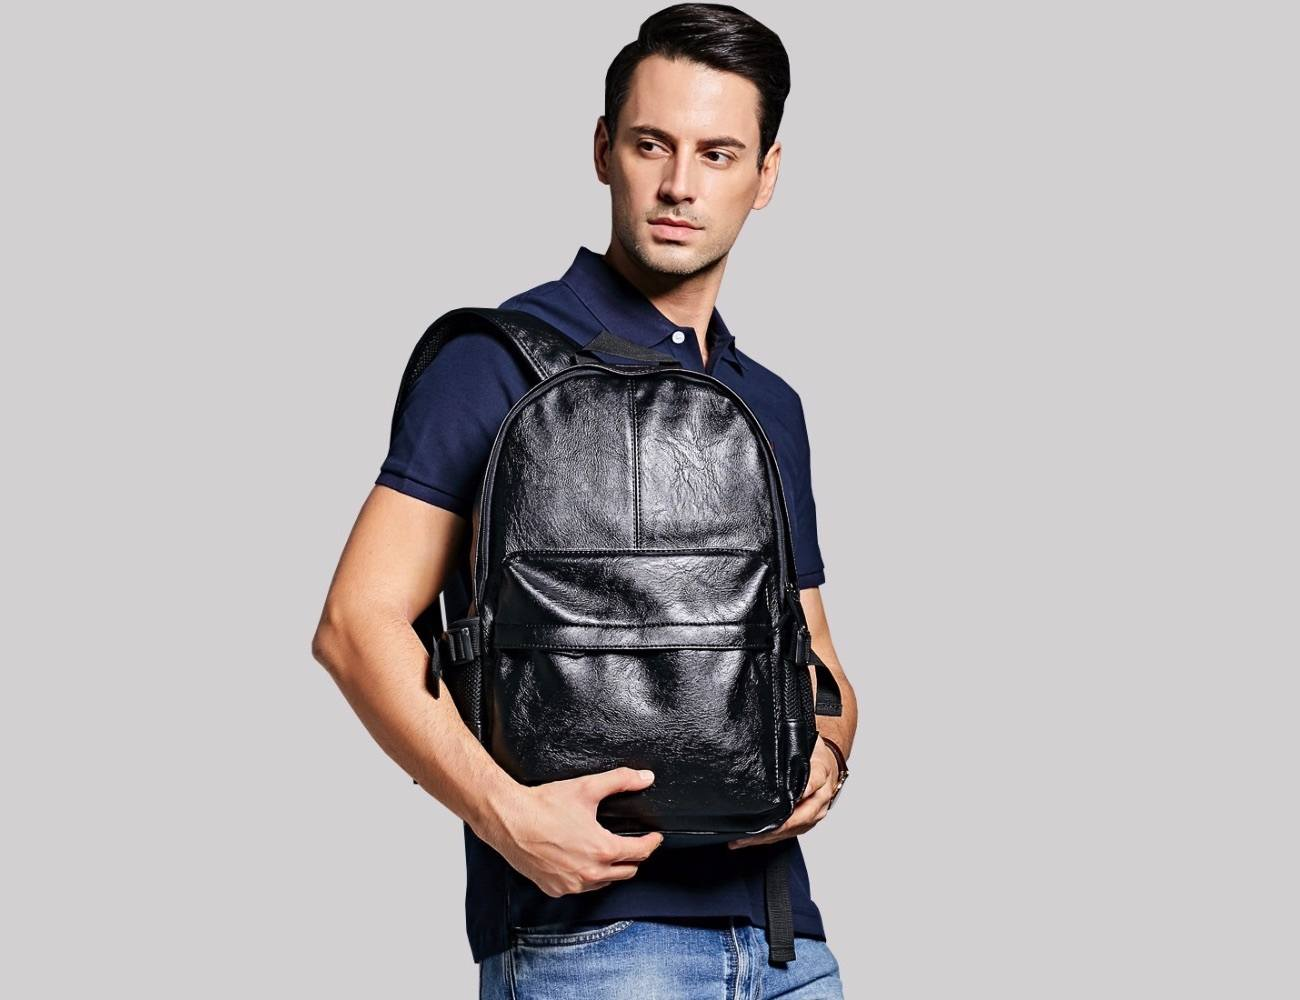 Large+Sized+Everyday+Leather+Backpack